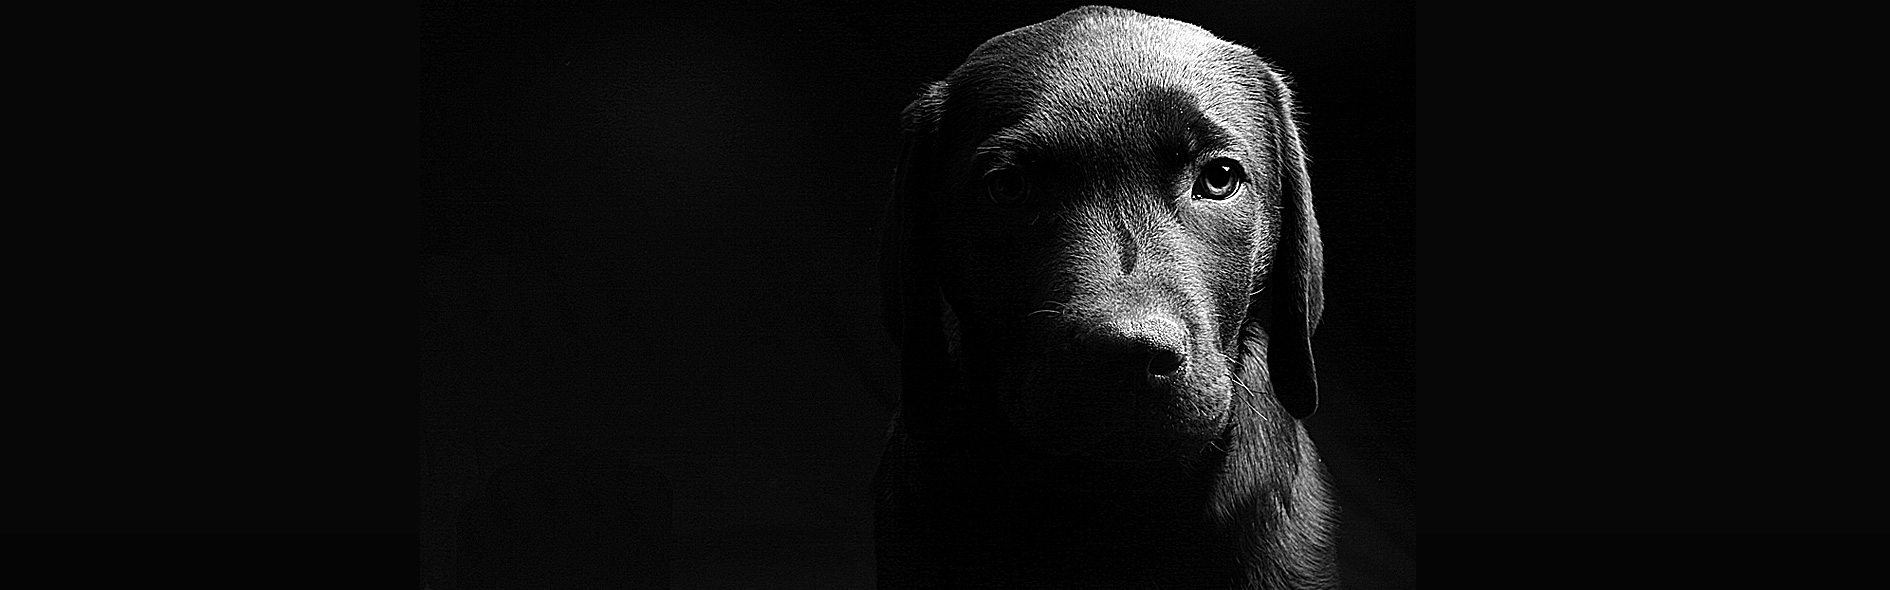 animal welfare cruelty rehabilitation